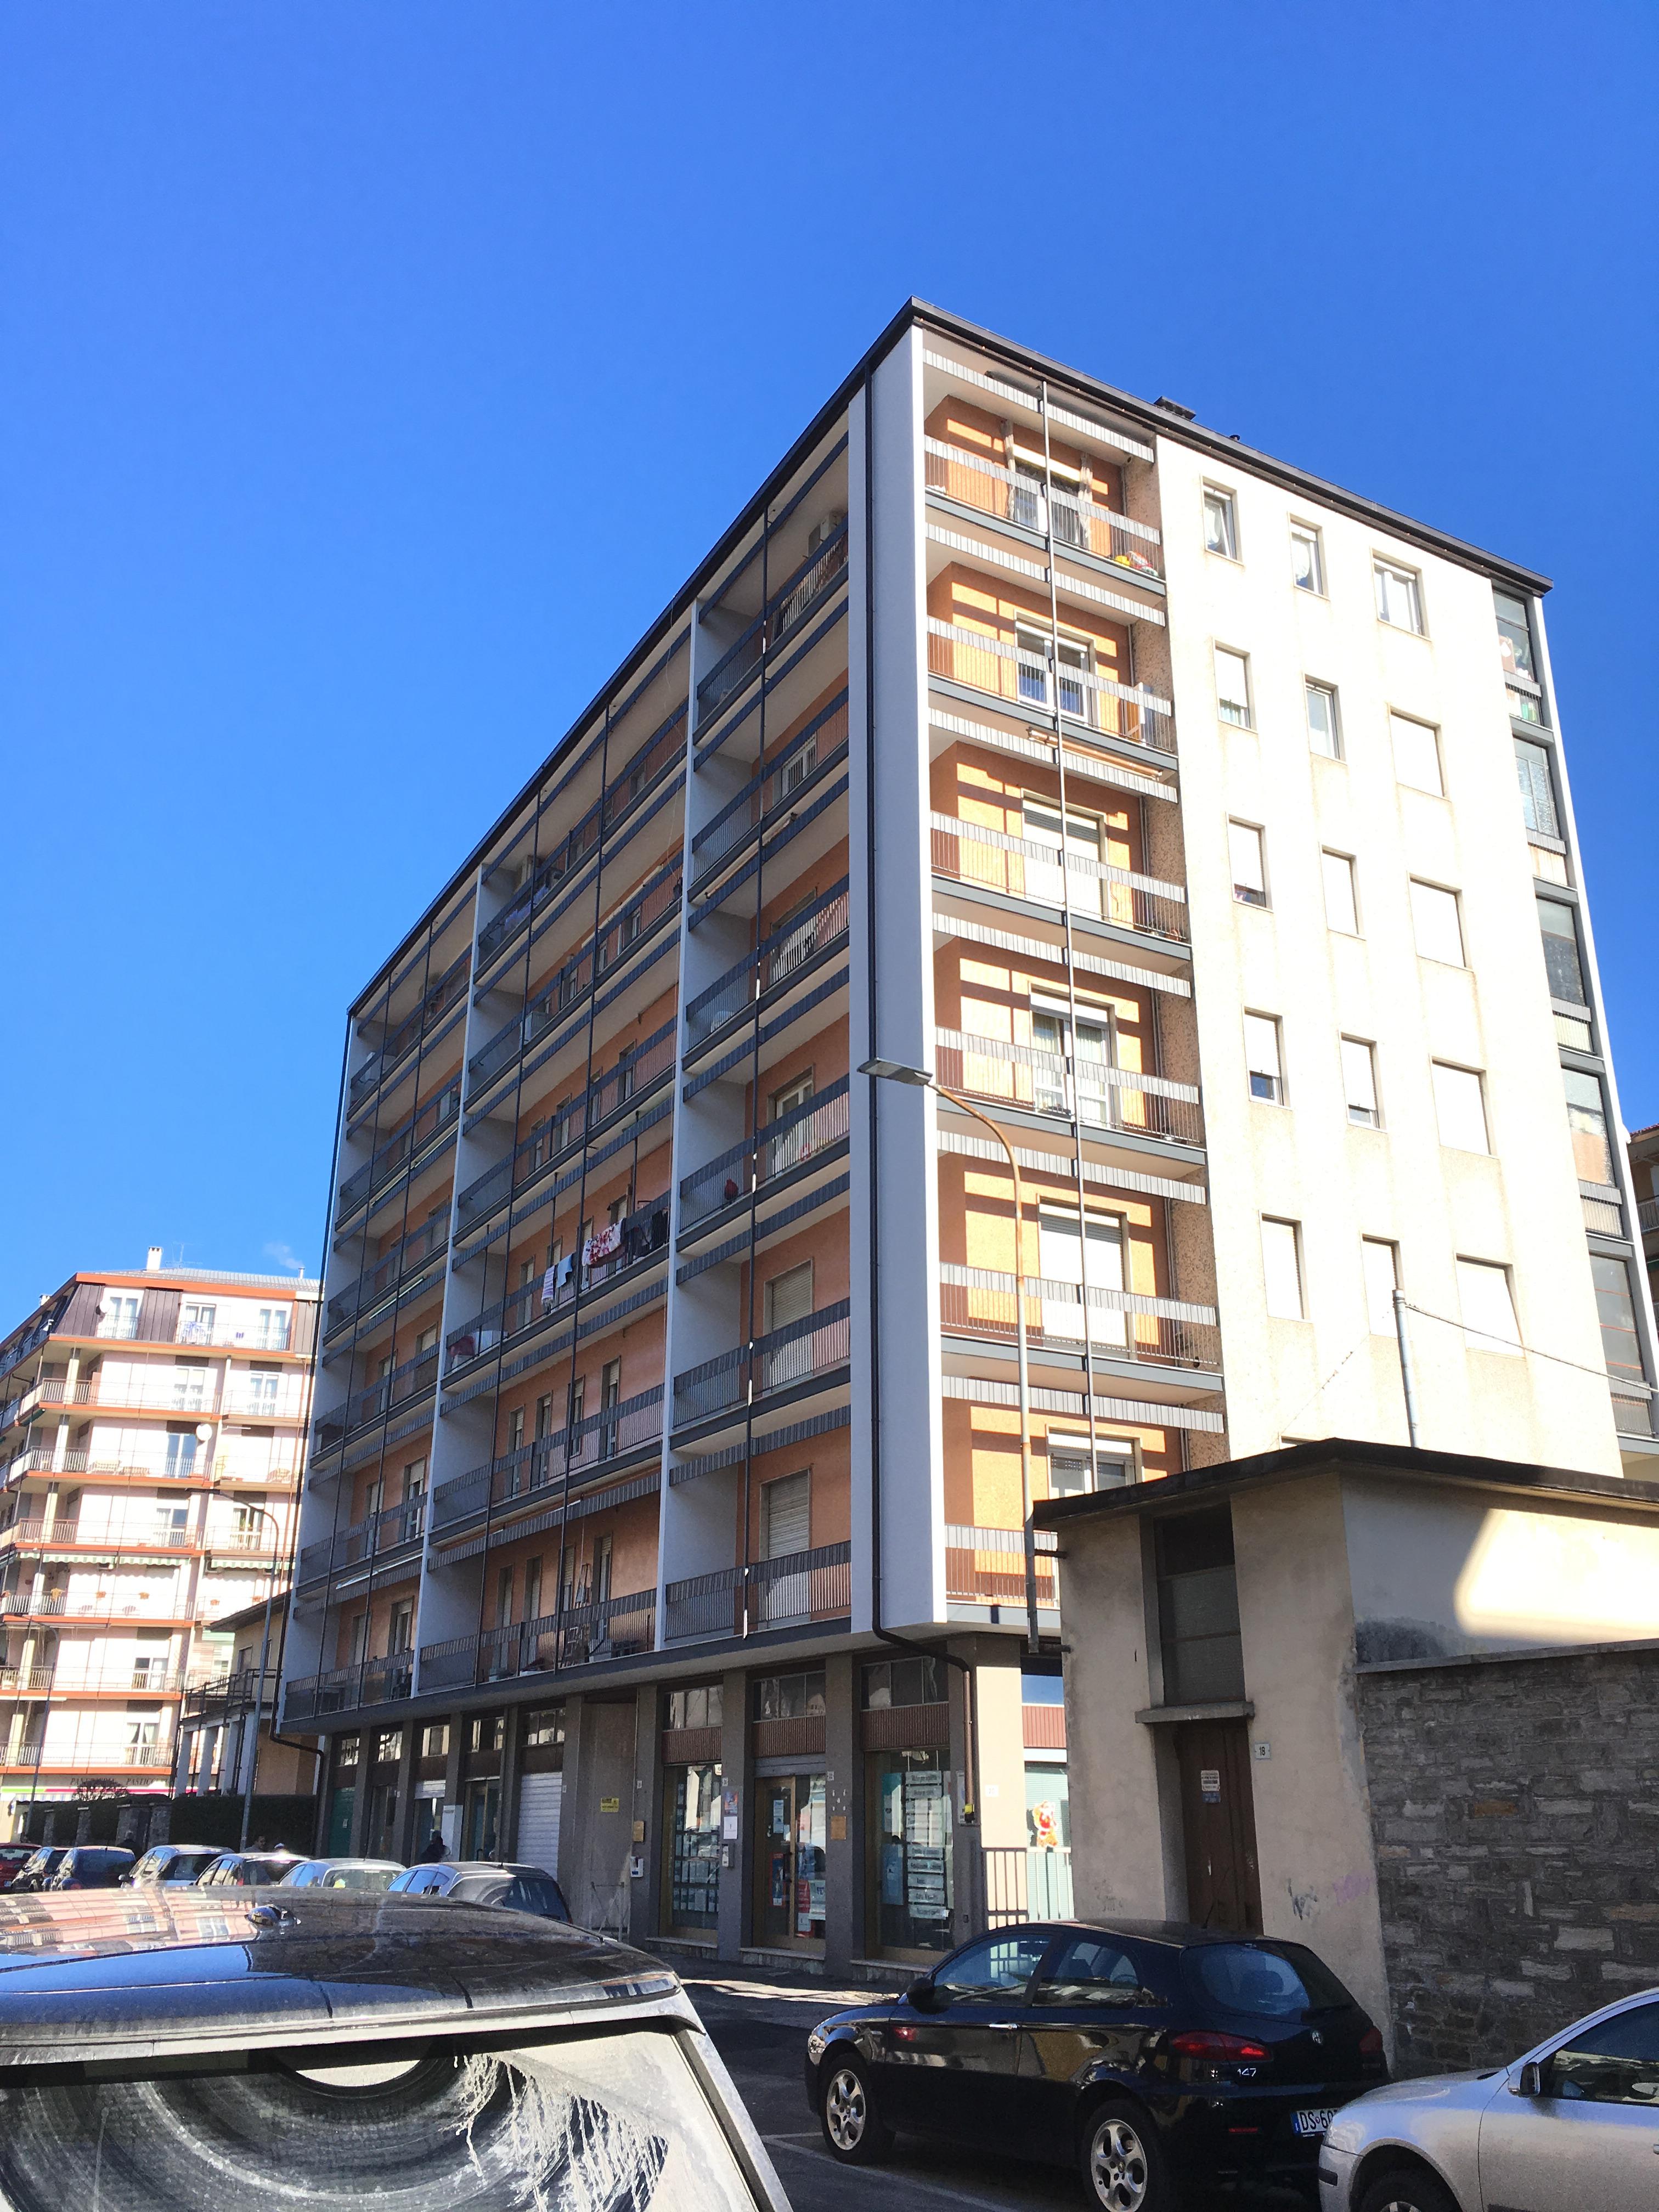 Affitasi Appartamento in Domodossola